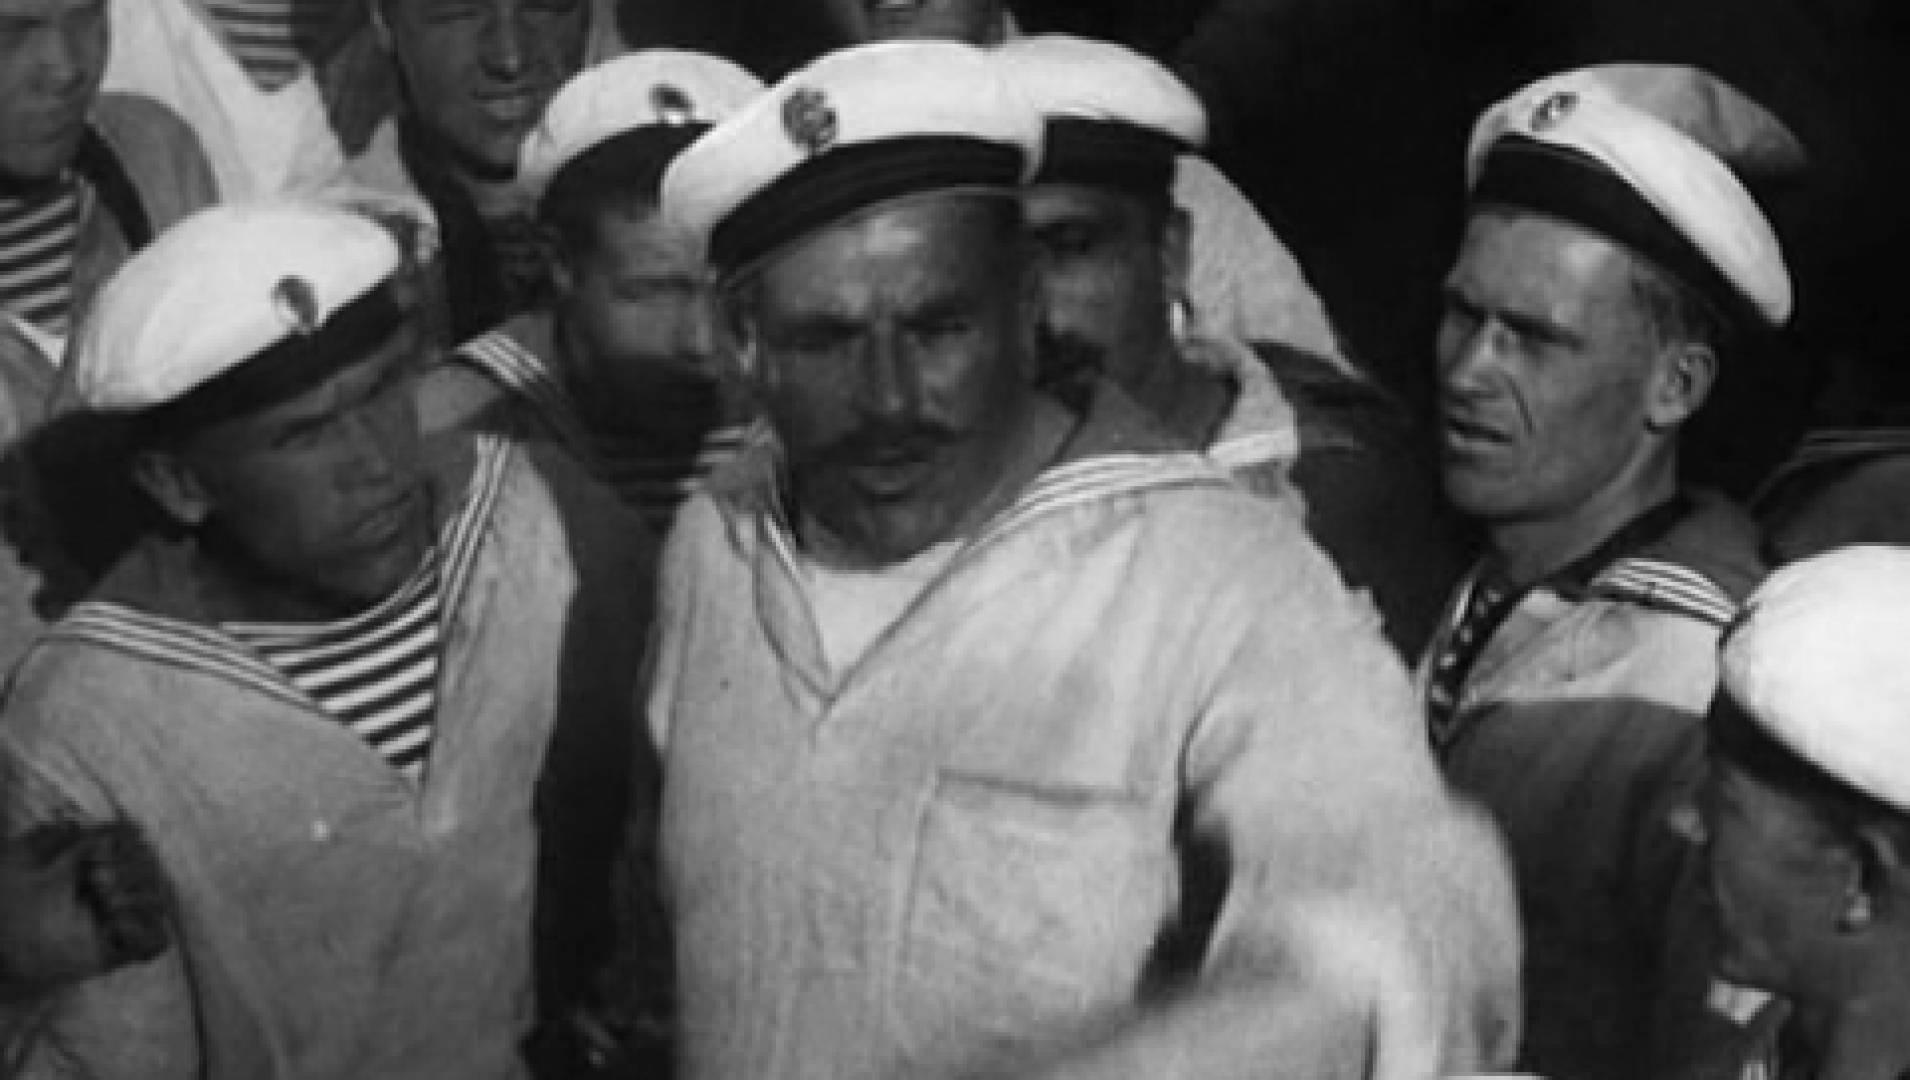 Броненосец «Потёмкин» - Драма, Фильм